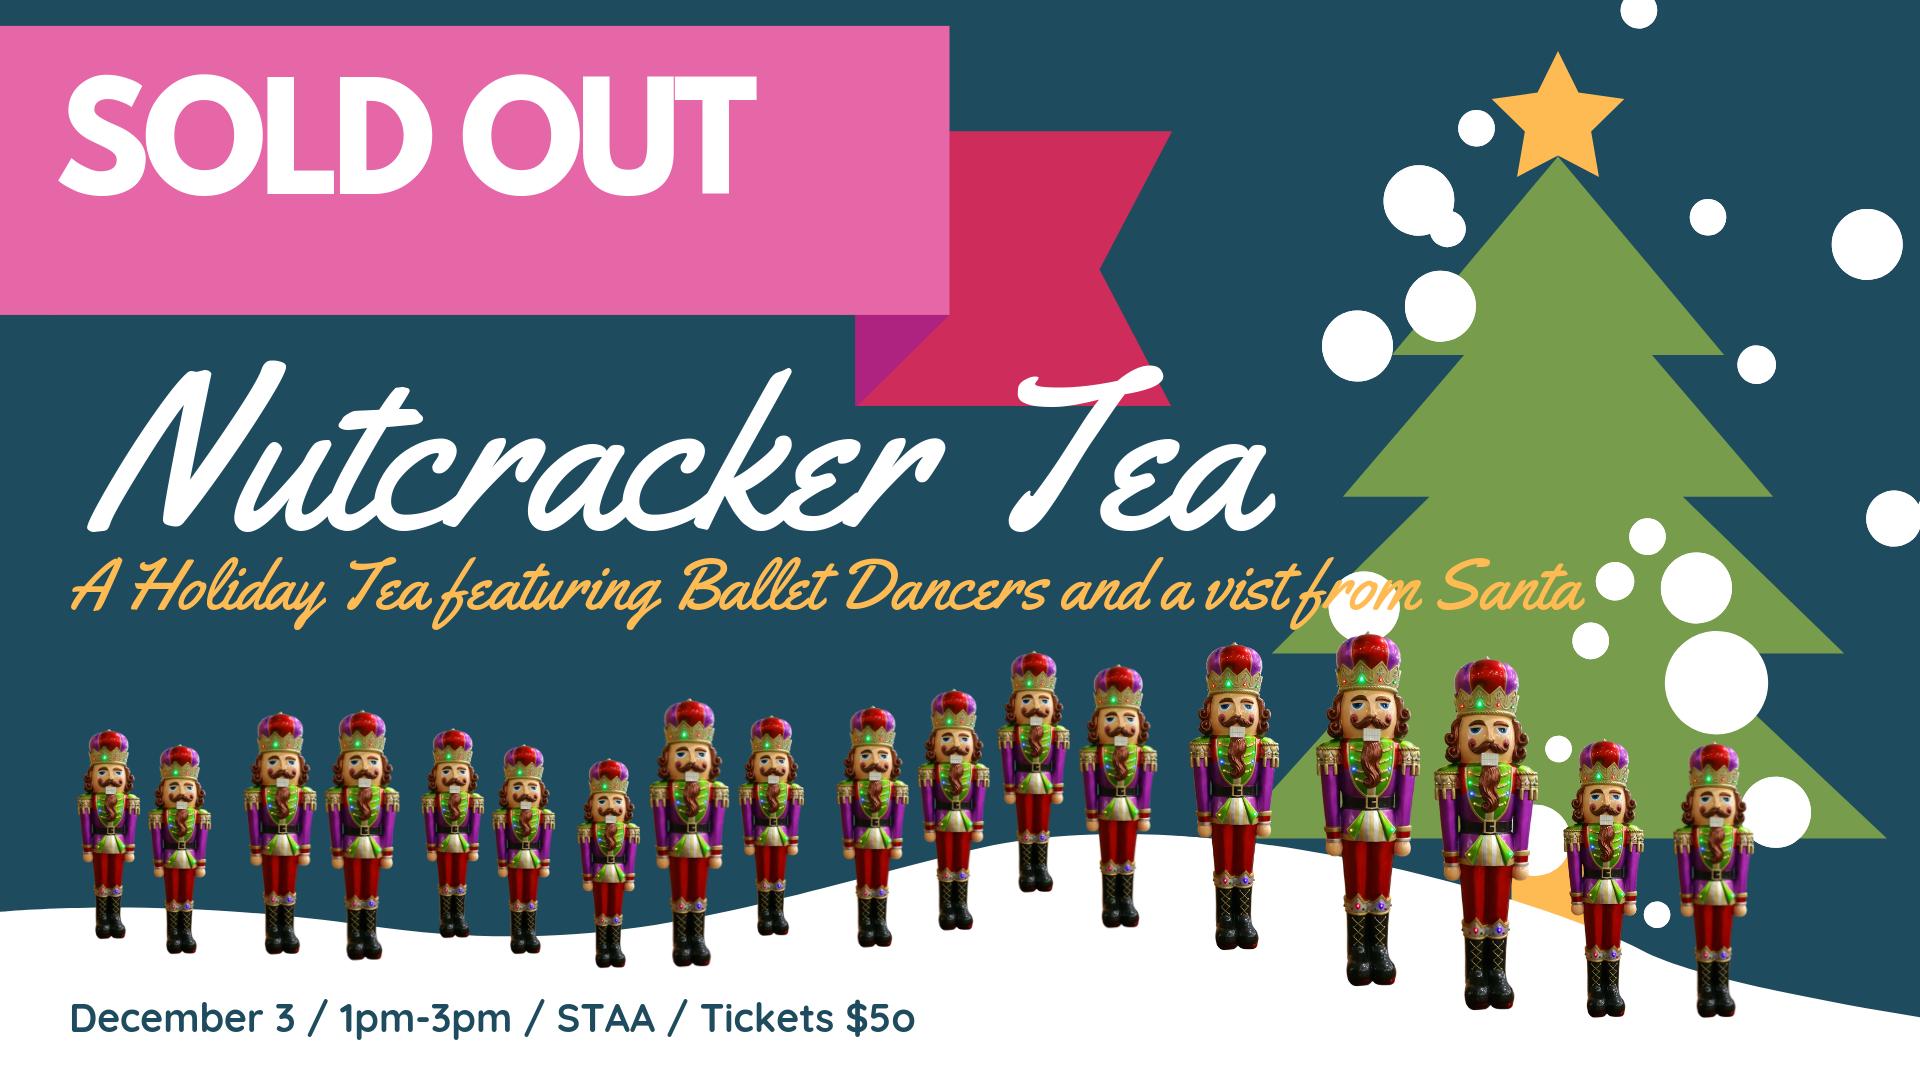 SOLD OUT - Nutcracker Tea.png